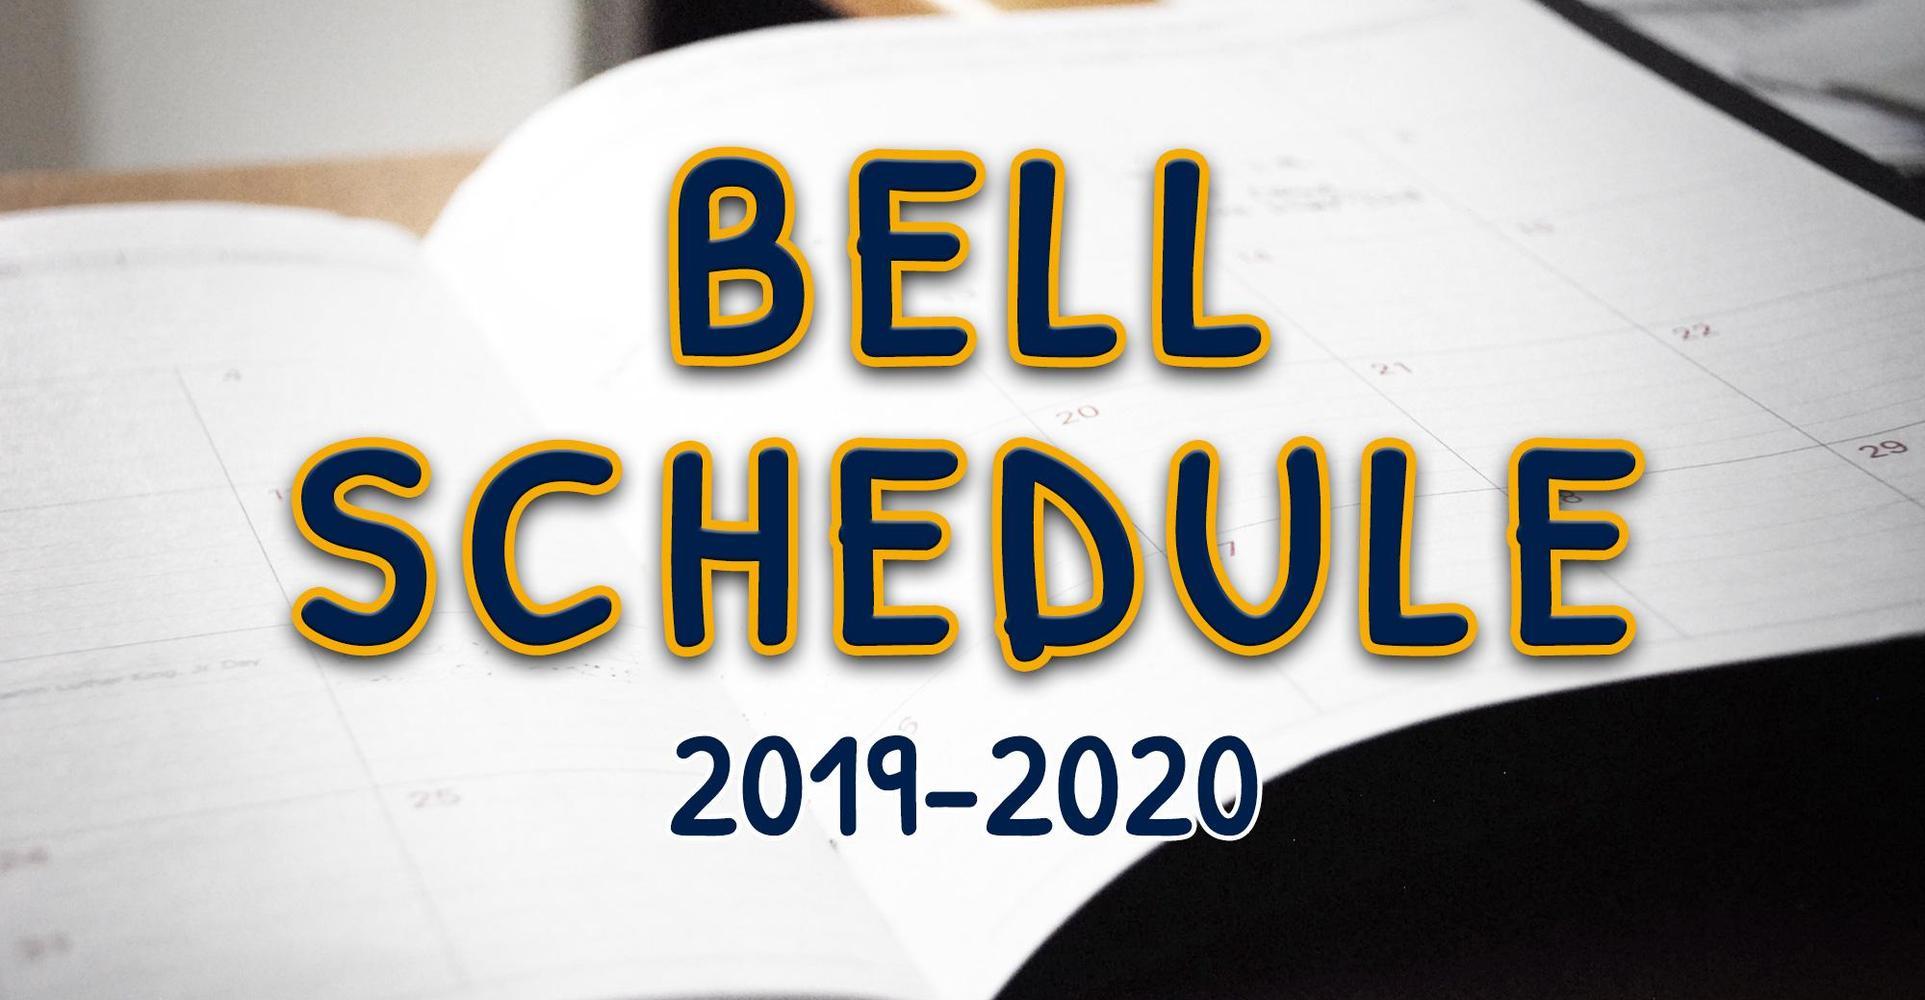 Bell Schedule (2019-2020)